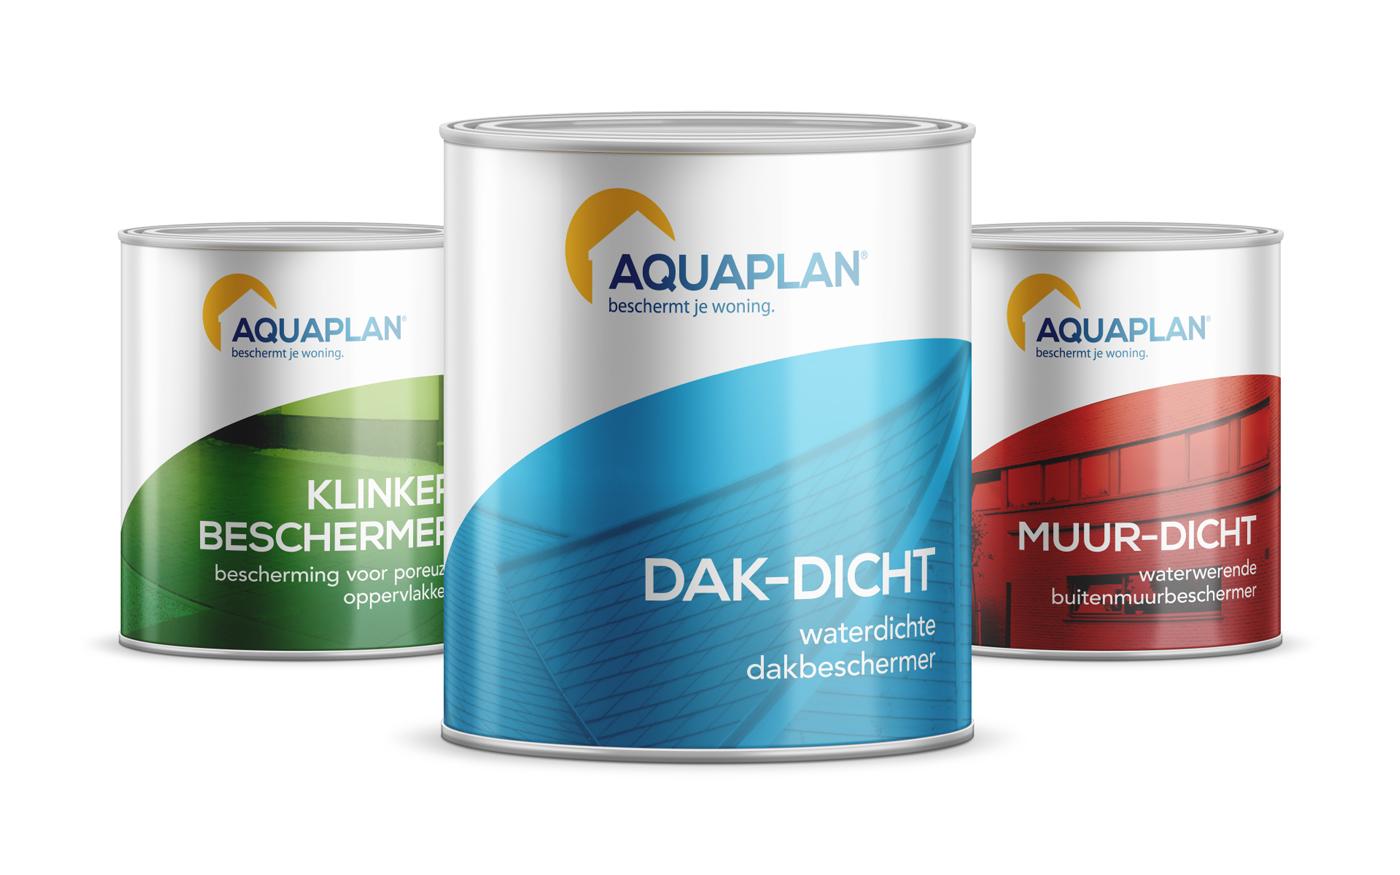 aqu_1400px_packaging